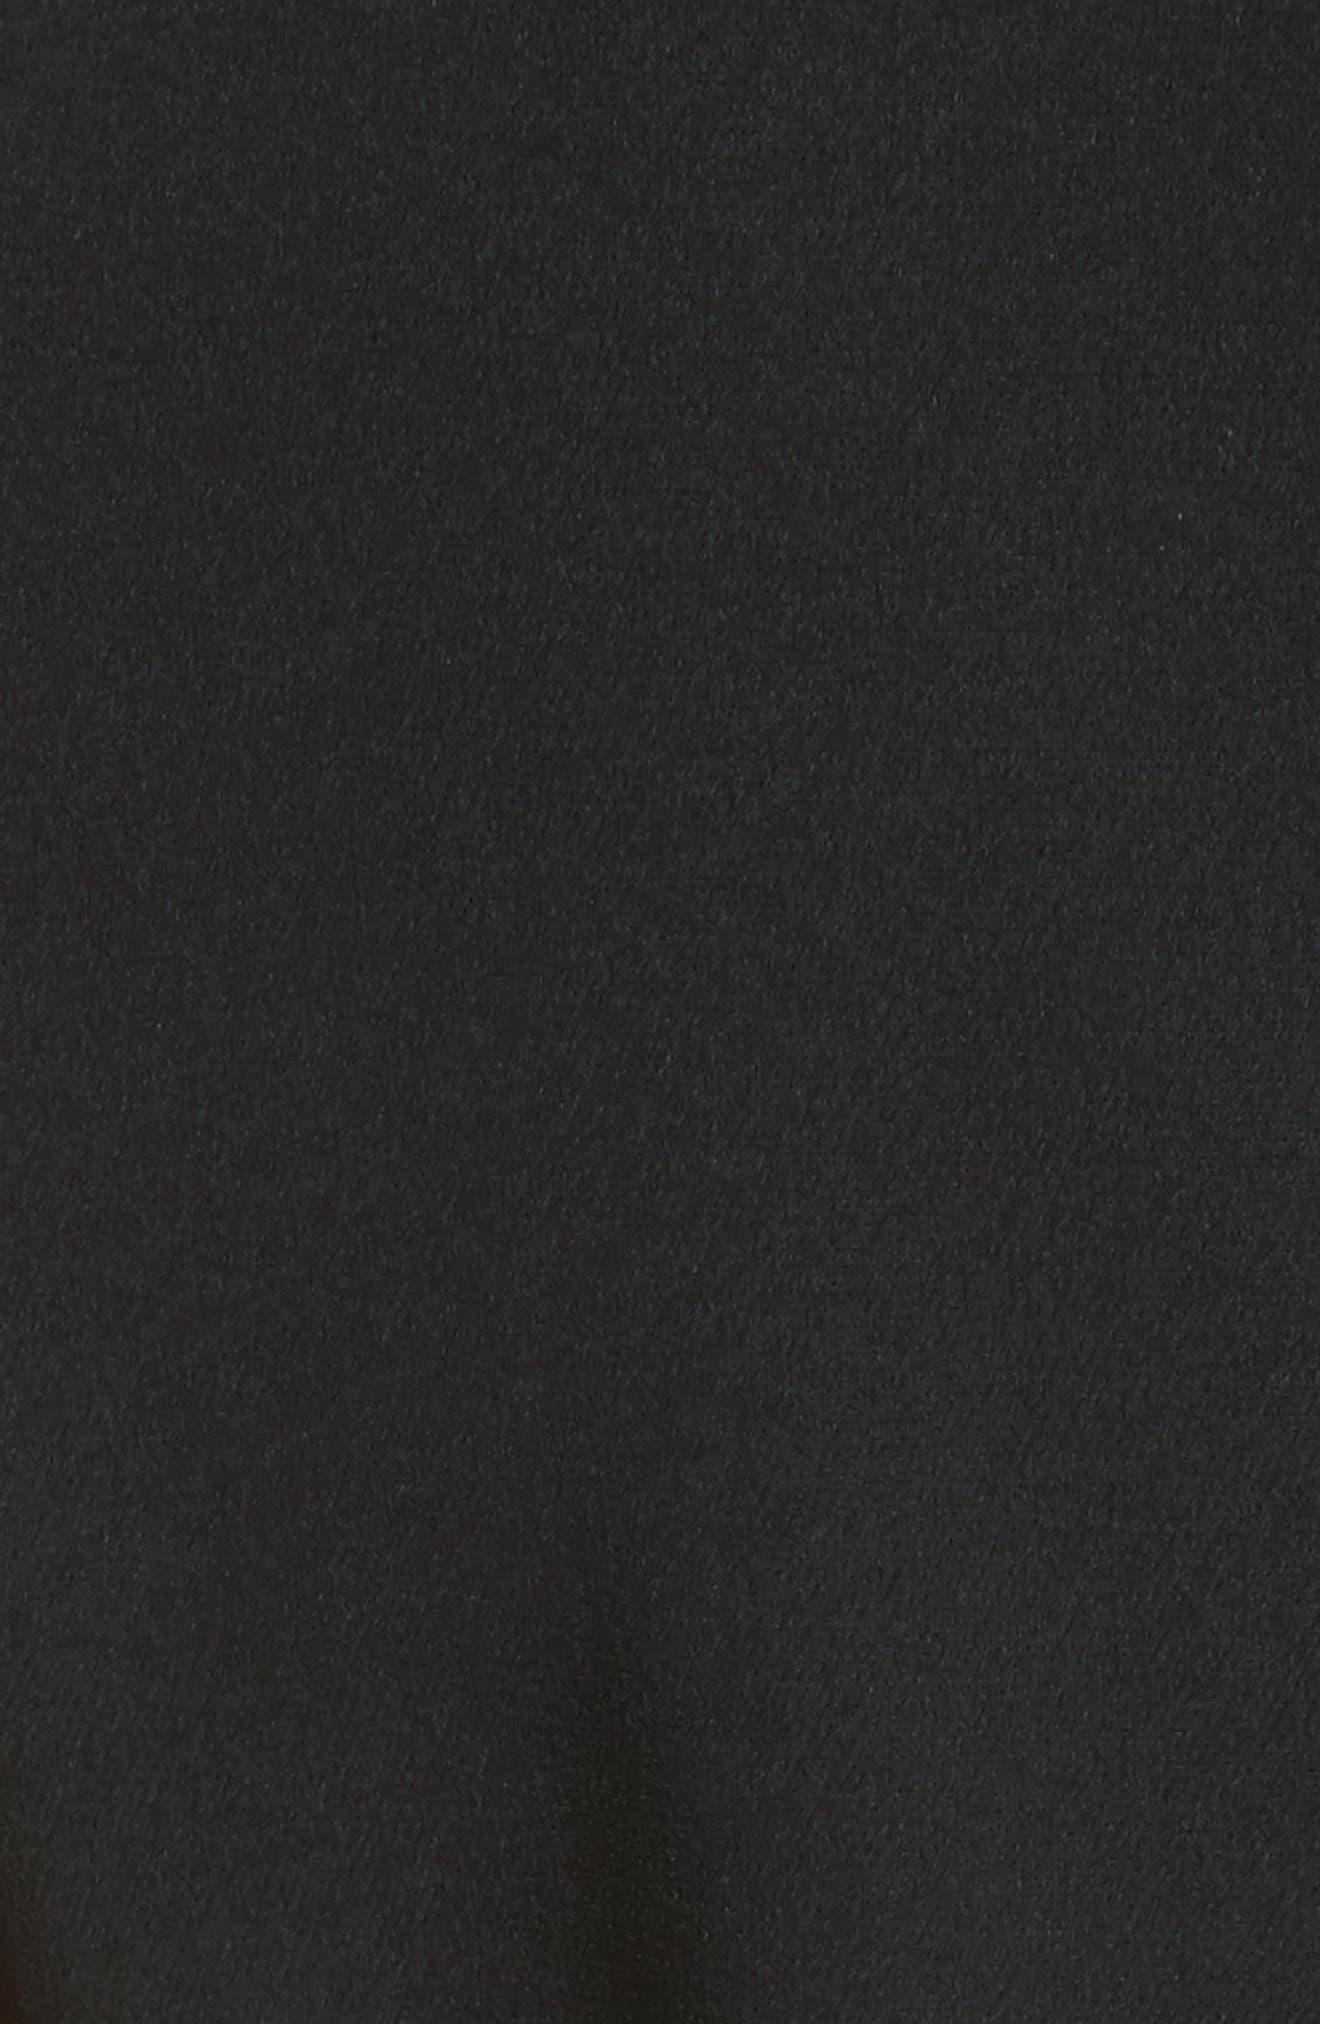 Jenny Stretch Crepe Fit & Flare Dress,                             Alternate thumbnail 5, color,                             White/ Black